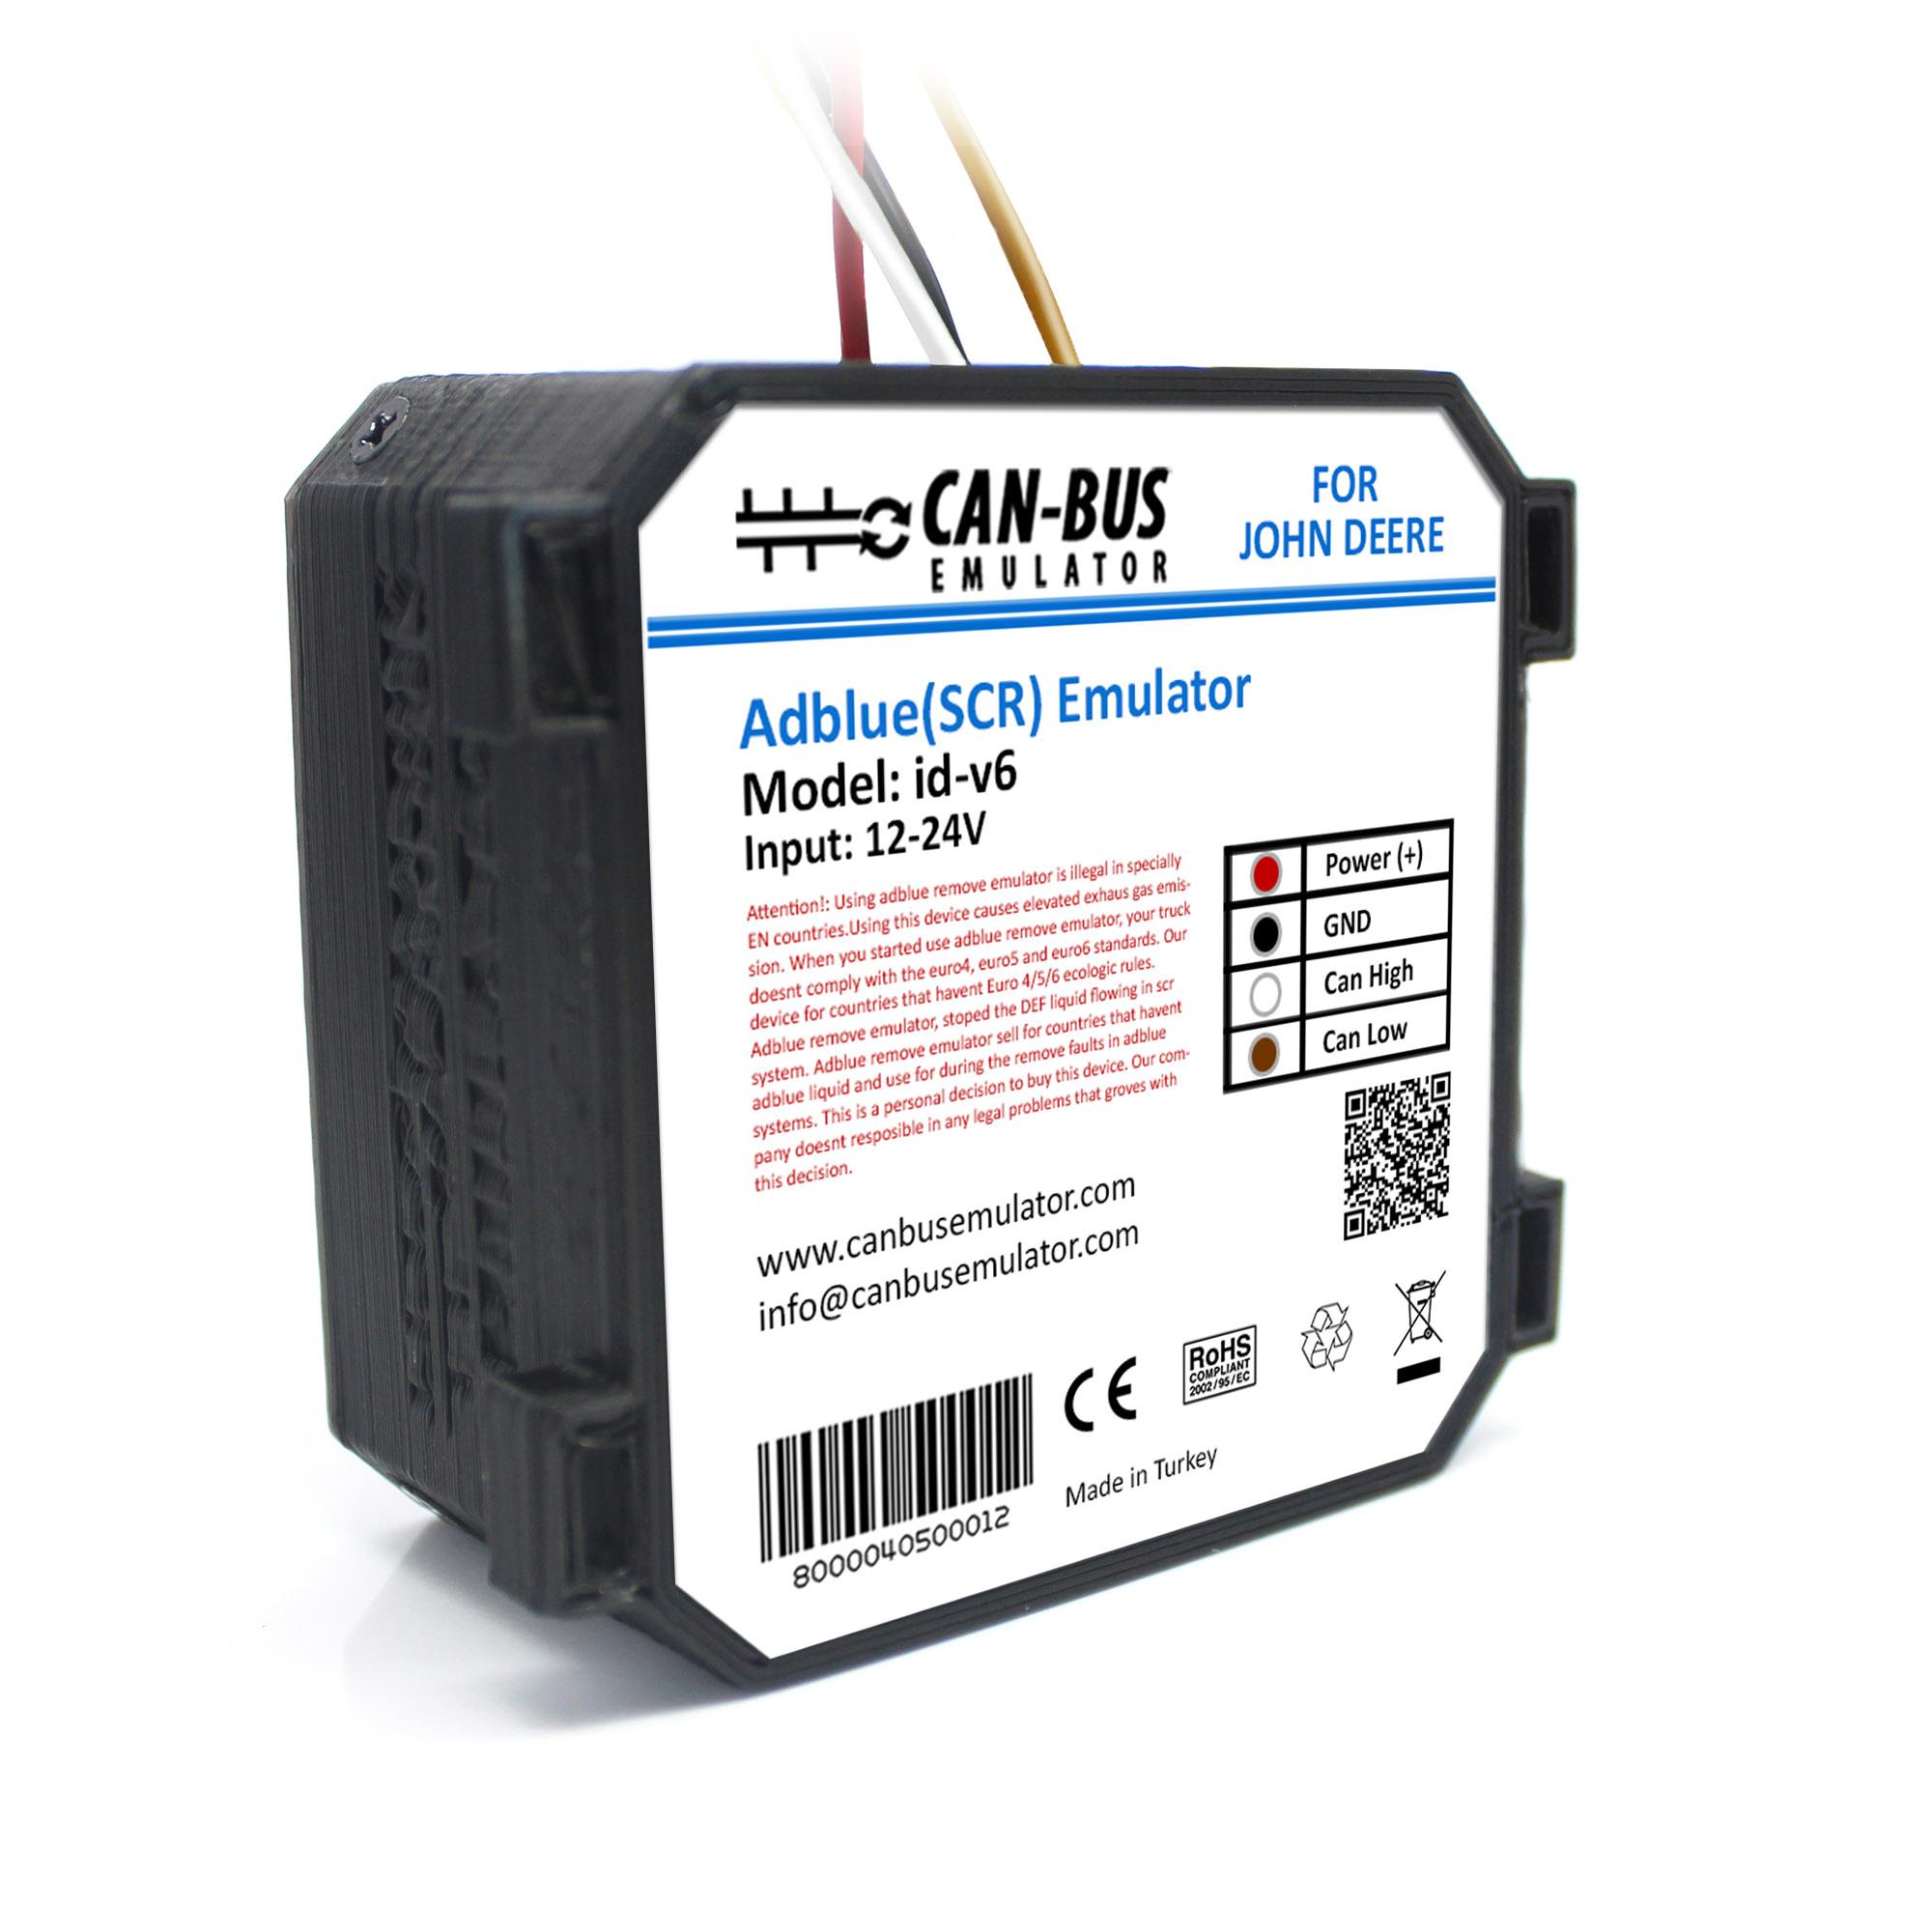 JOHN DEERE Euro 6 Adblue (SCR) Emulator